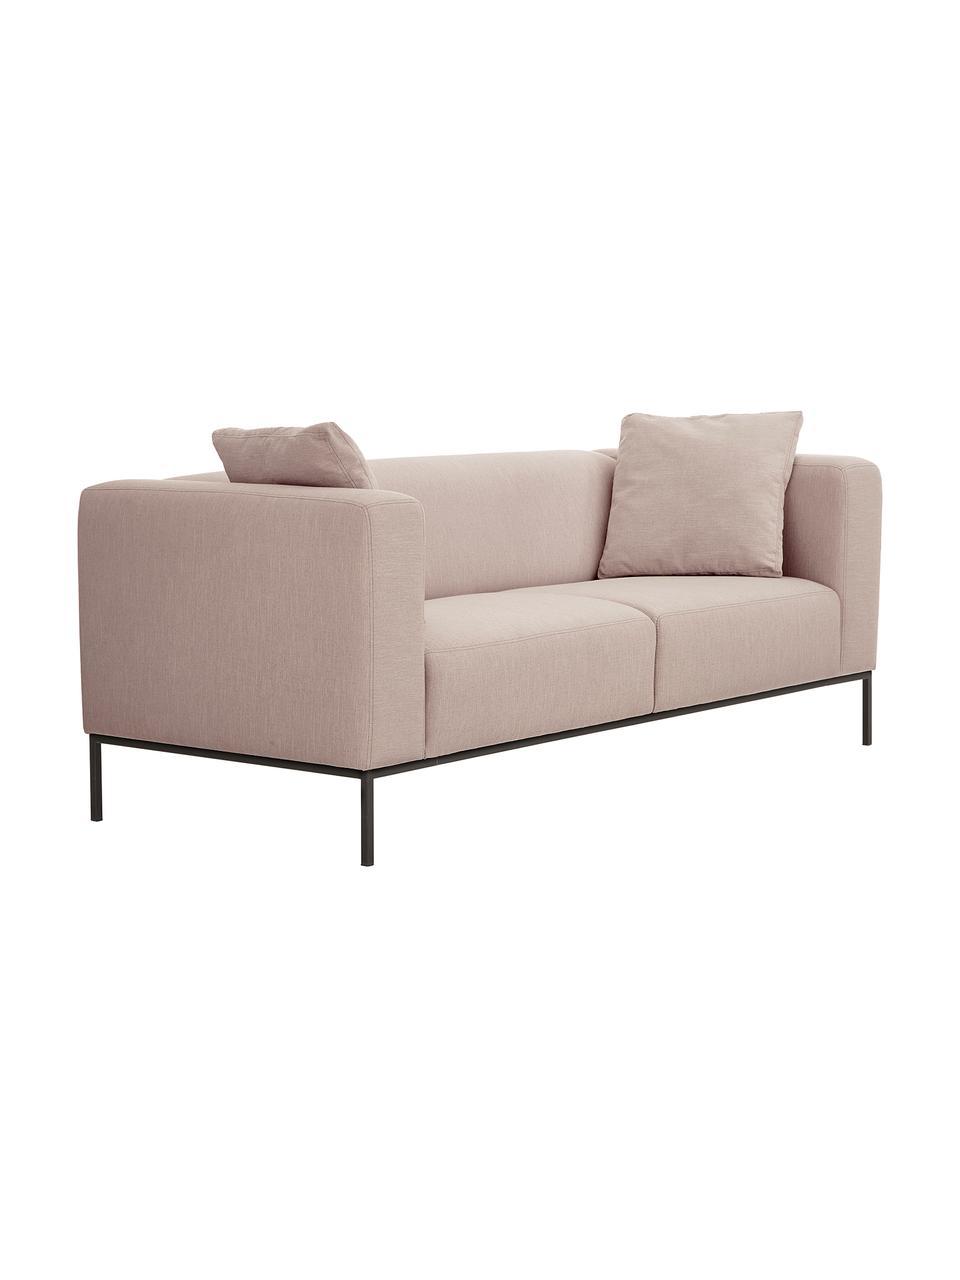 Sofa Carrie (3-Sitzer) in Altrosa mit Metall-Füßen, Bezug: Polyester 50.000 Scheuert, Gestell: Spanholz, Hartfaserplatte, Füße: Metall, lackiert, Webstoff Altrosa, B 202 x T 86 cm